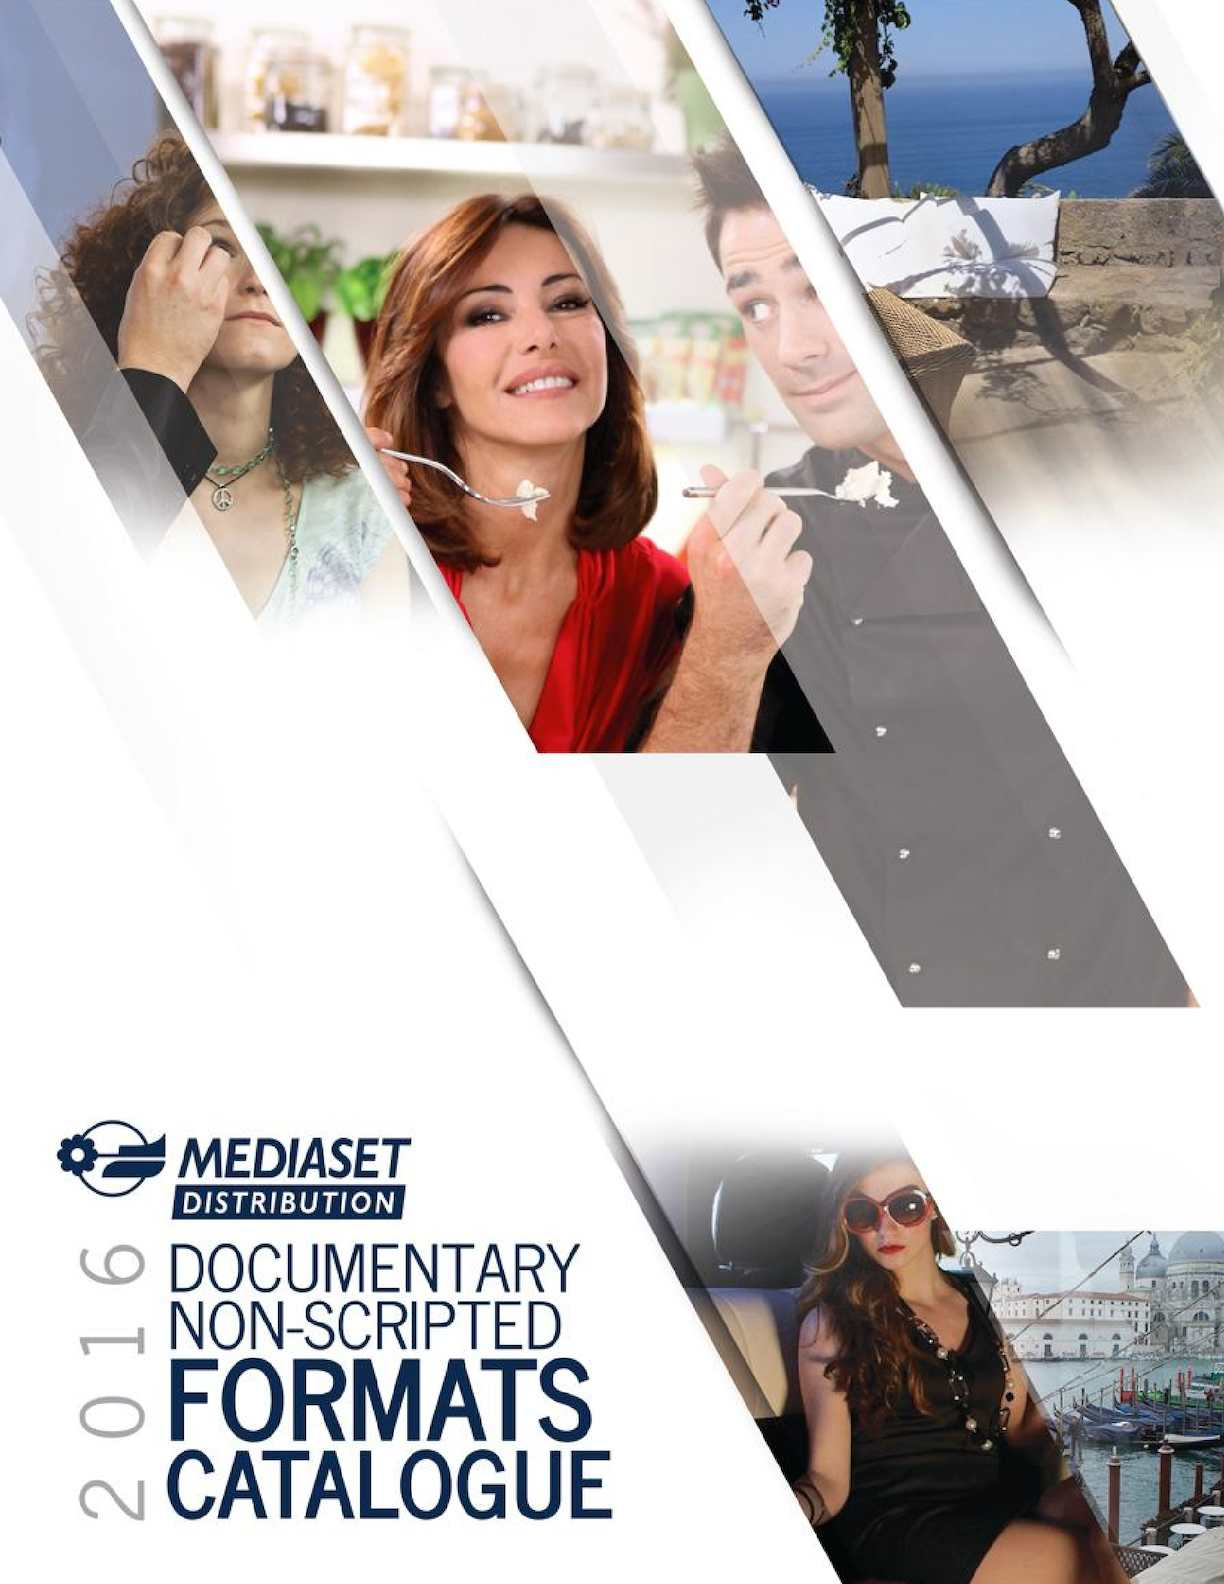 Press Formatos Mediaset